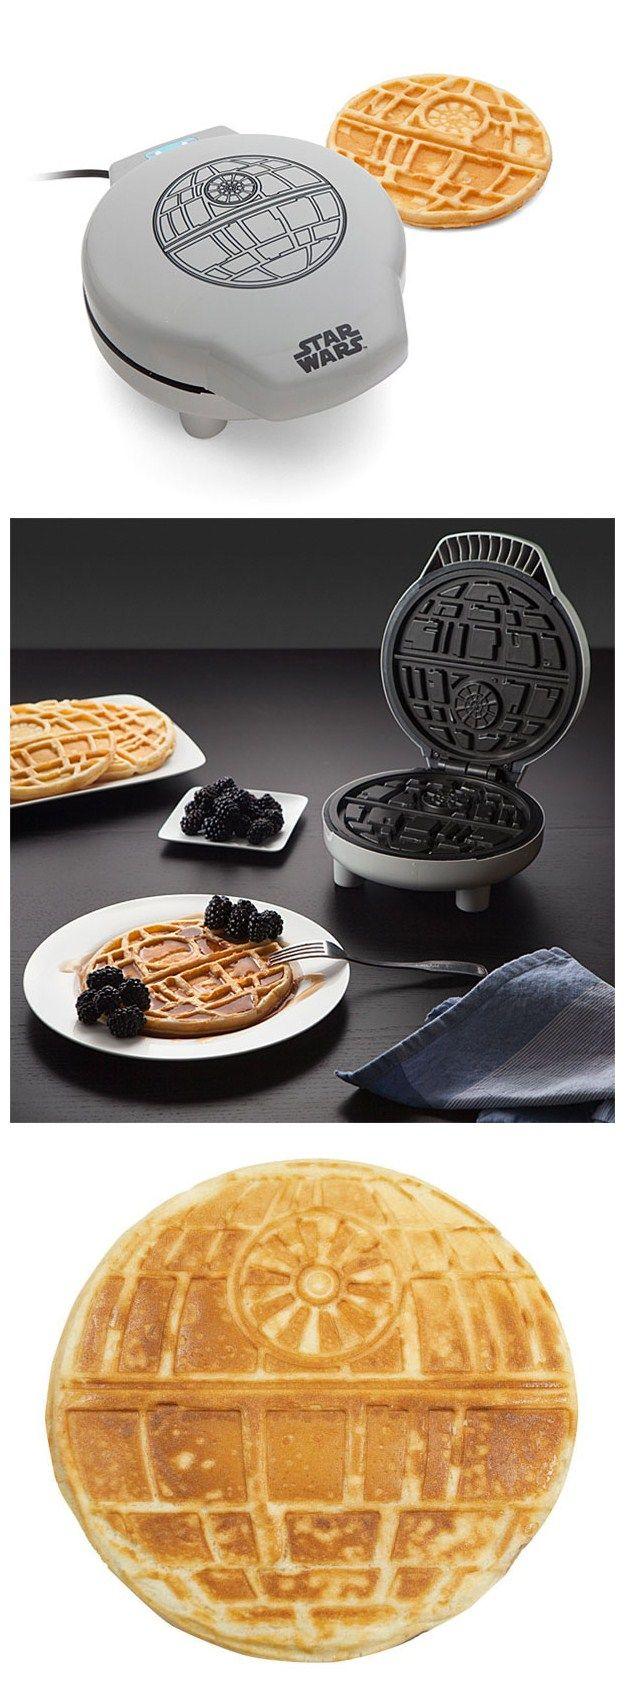 Star Wars Waffle Maker Bakes Death Stars For Breakfast